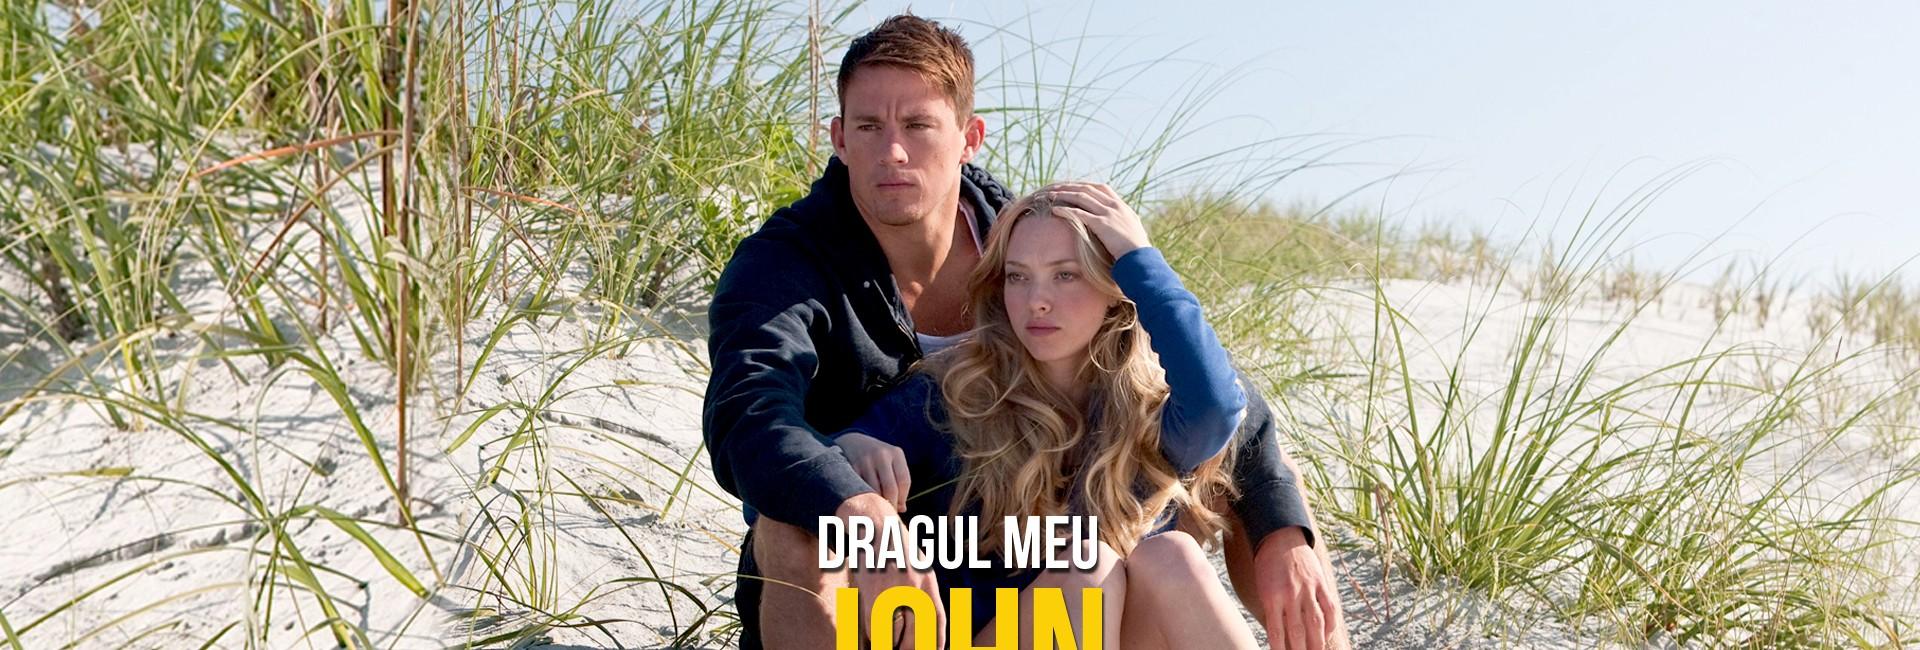 DRAGUL MEU JOHN